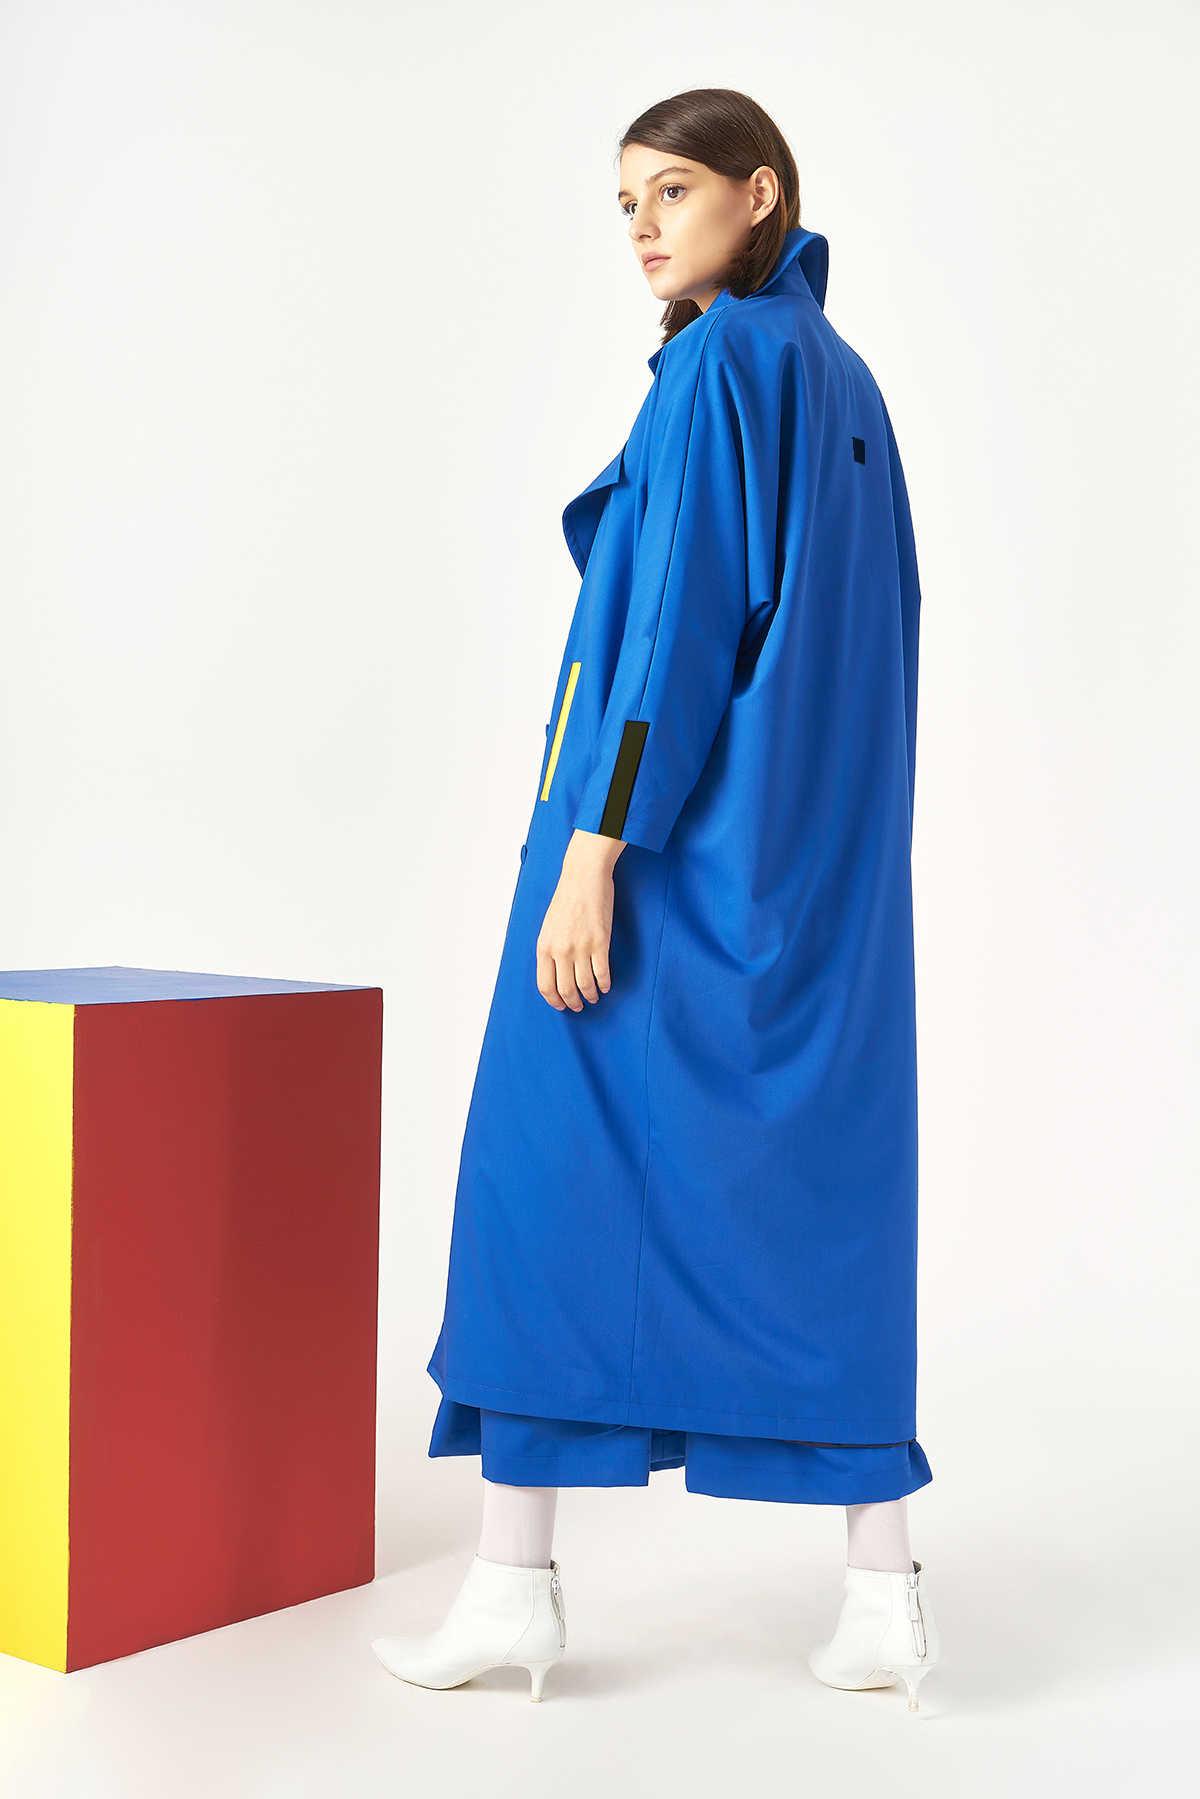 Kuaybe Gider - Kuaybe Gider Mavi Kadın Trench 7100